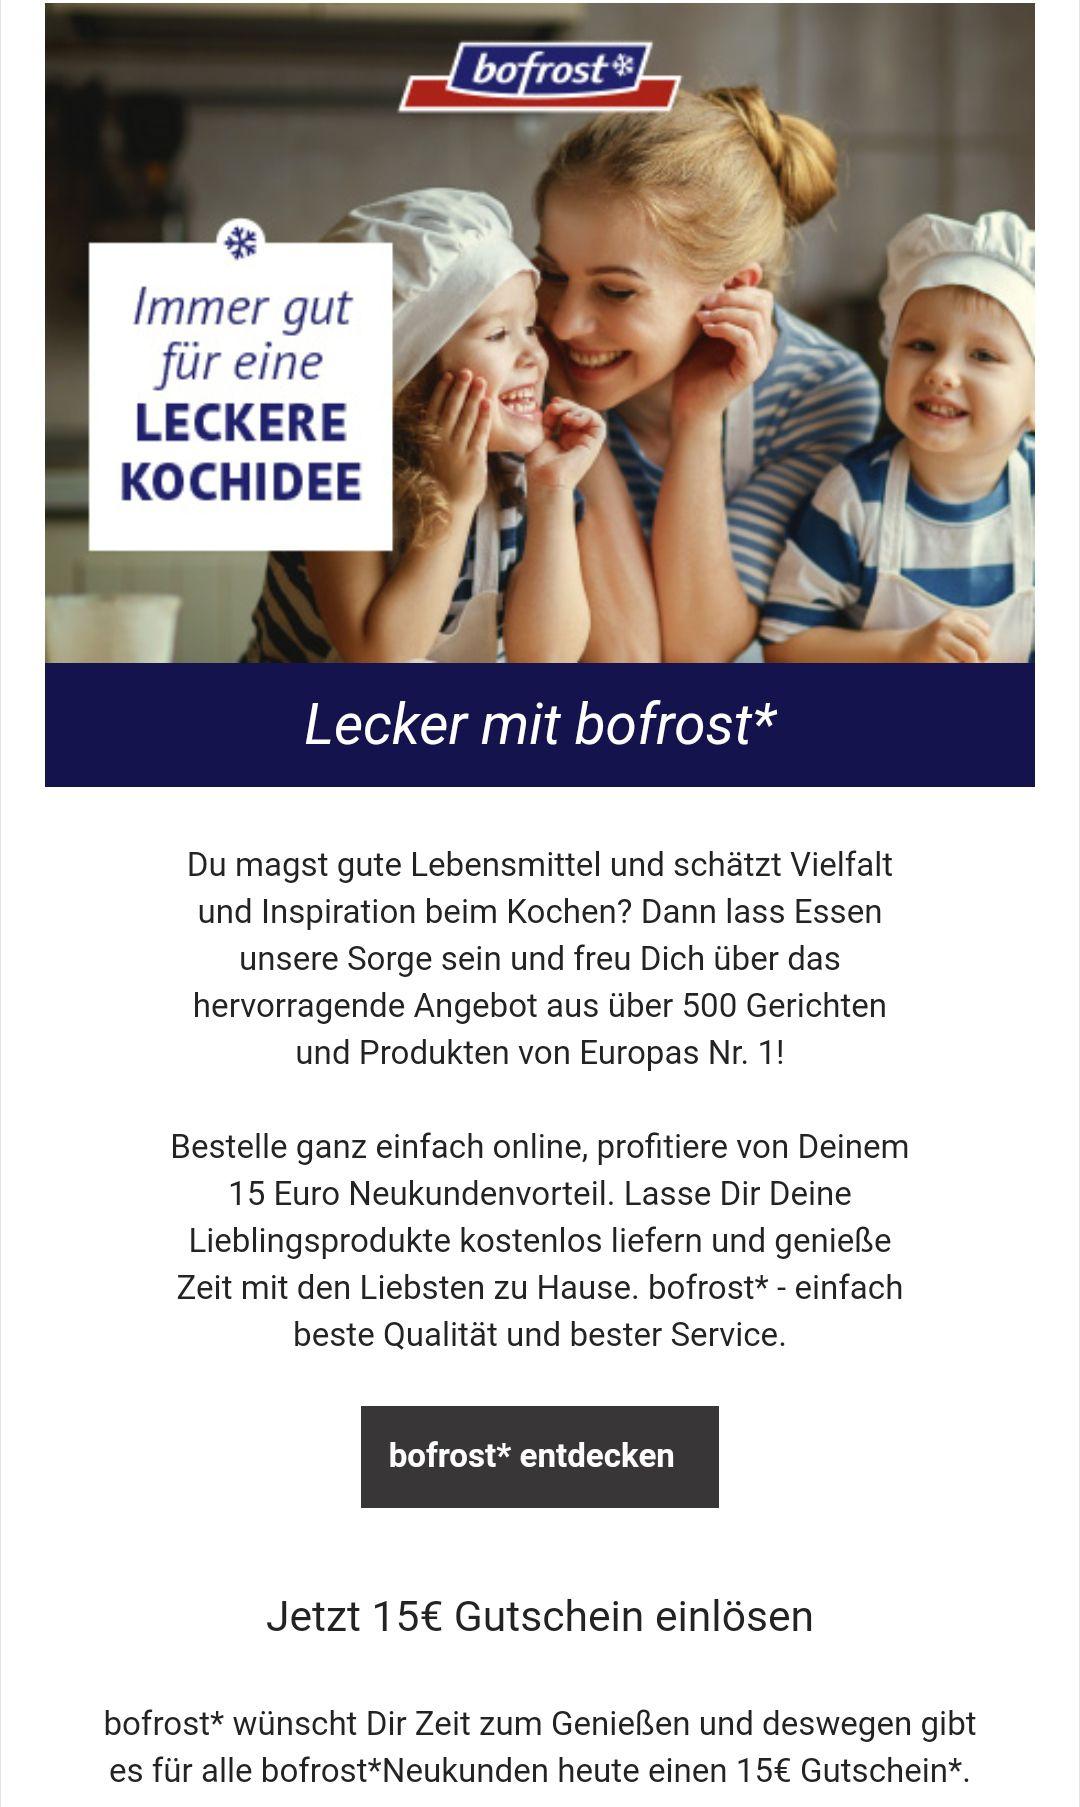 Bofrost Neukundenrabatt -15€ bei 45€ Mindestbestellwert